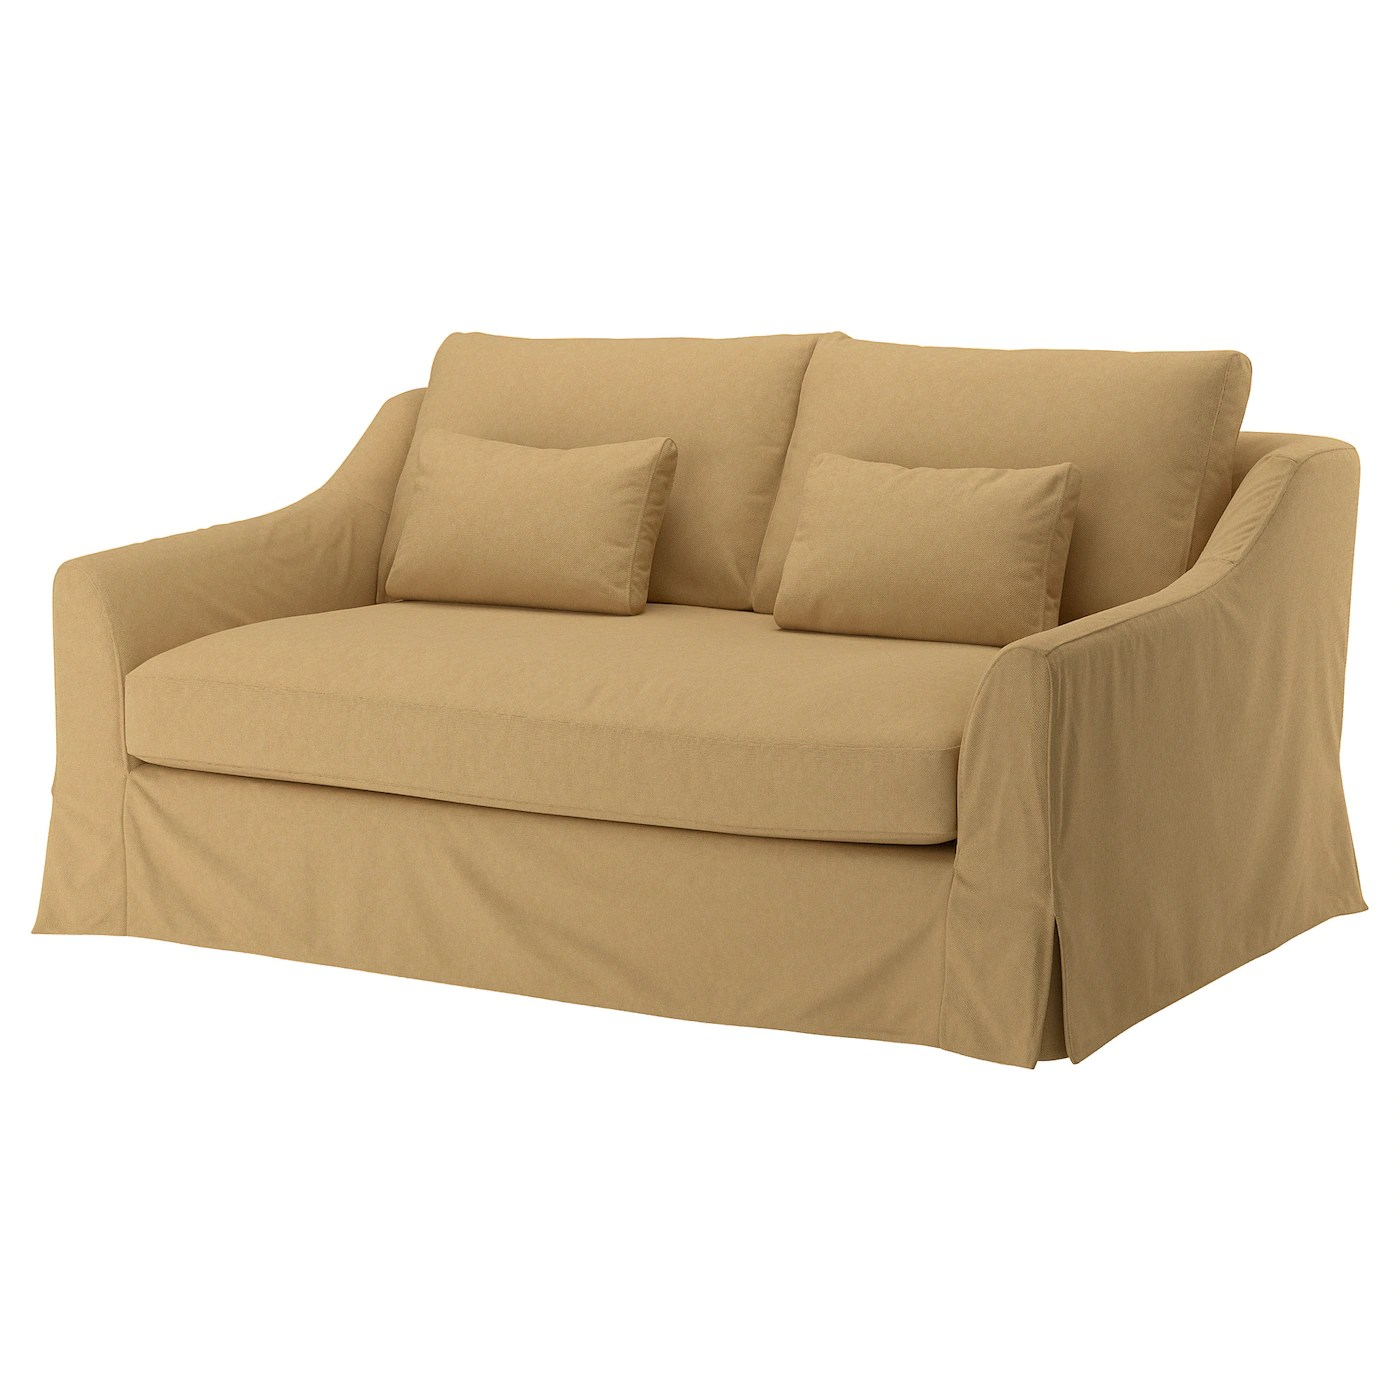 guineys dining chair covers harmony high recall sofa ikea ireland dublin farlov cover for 2 seat